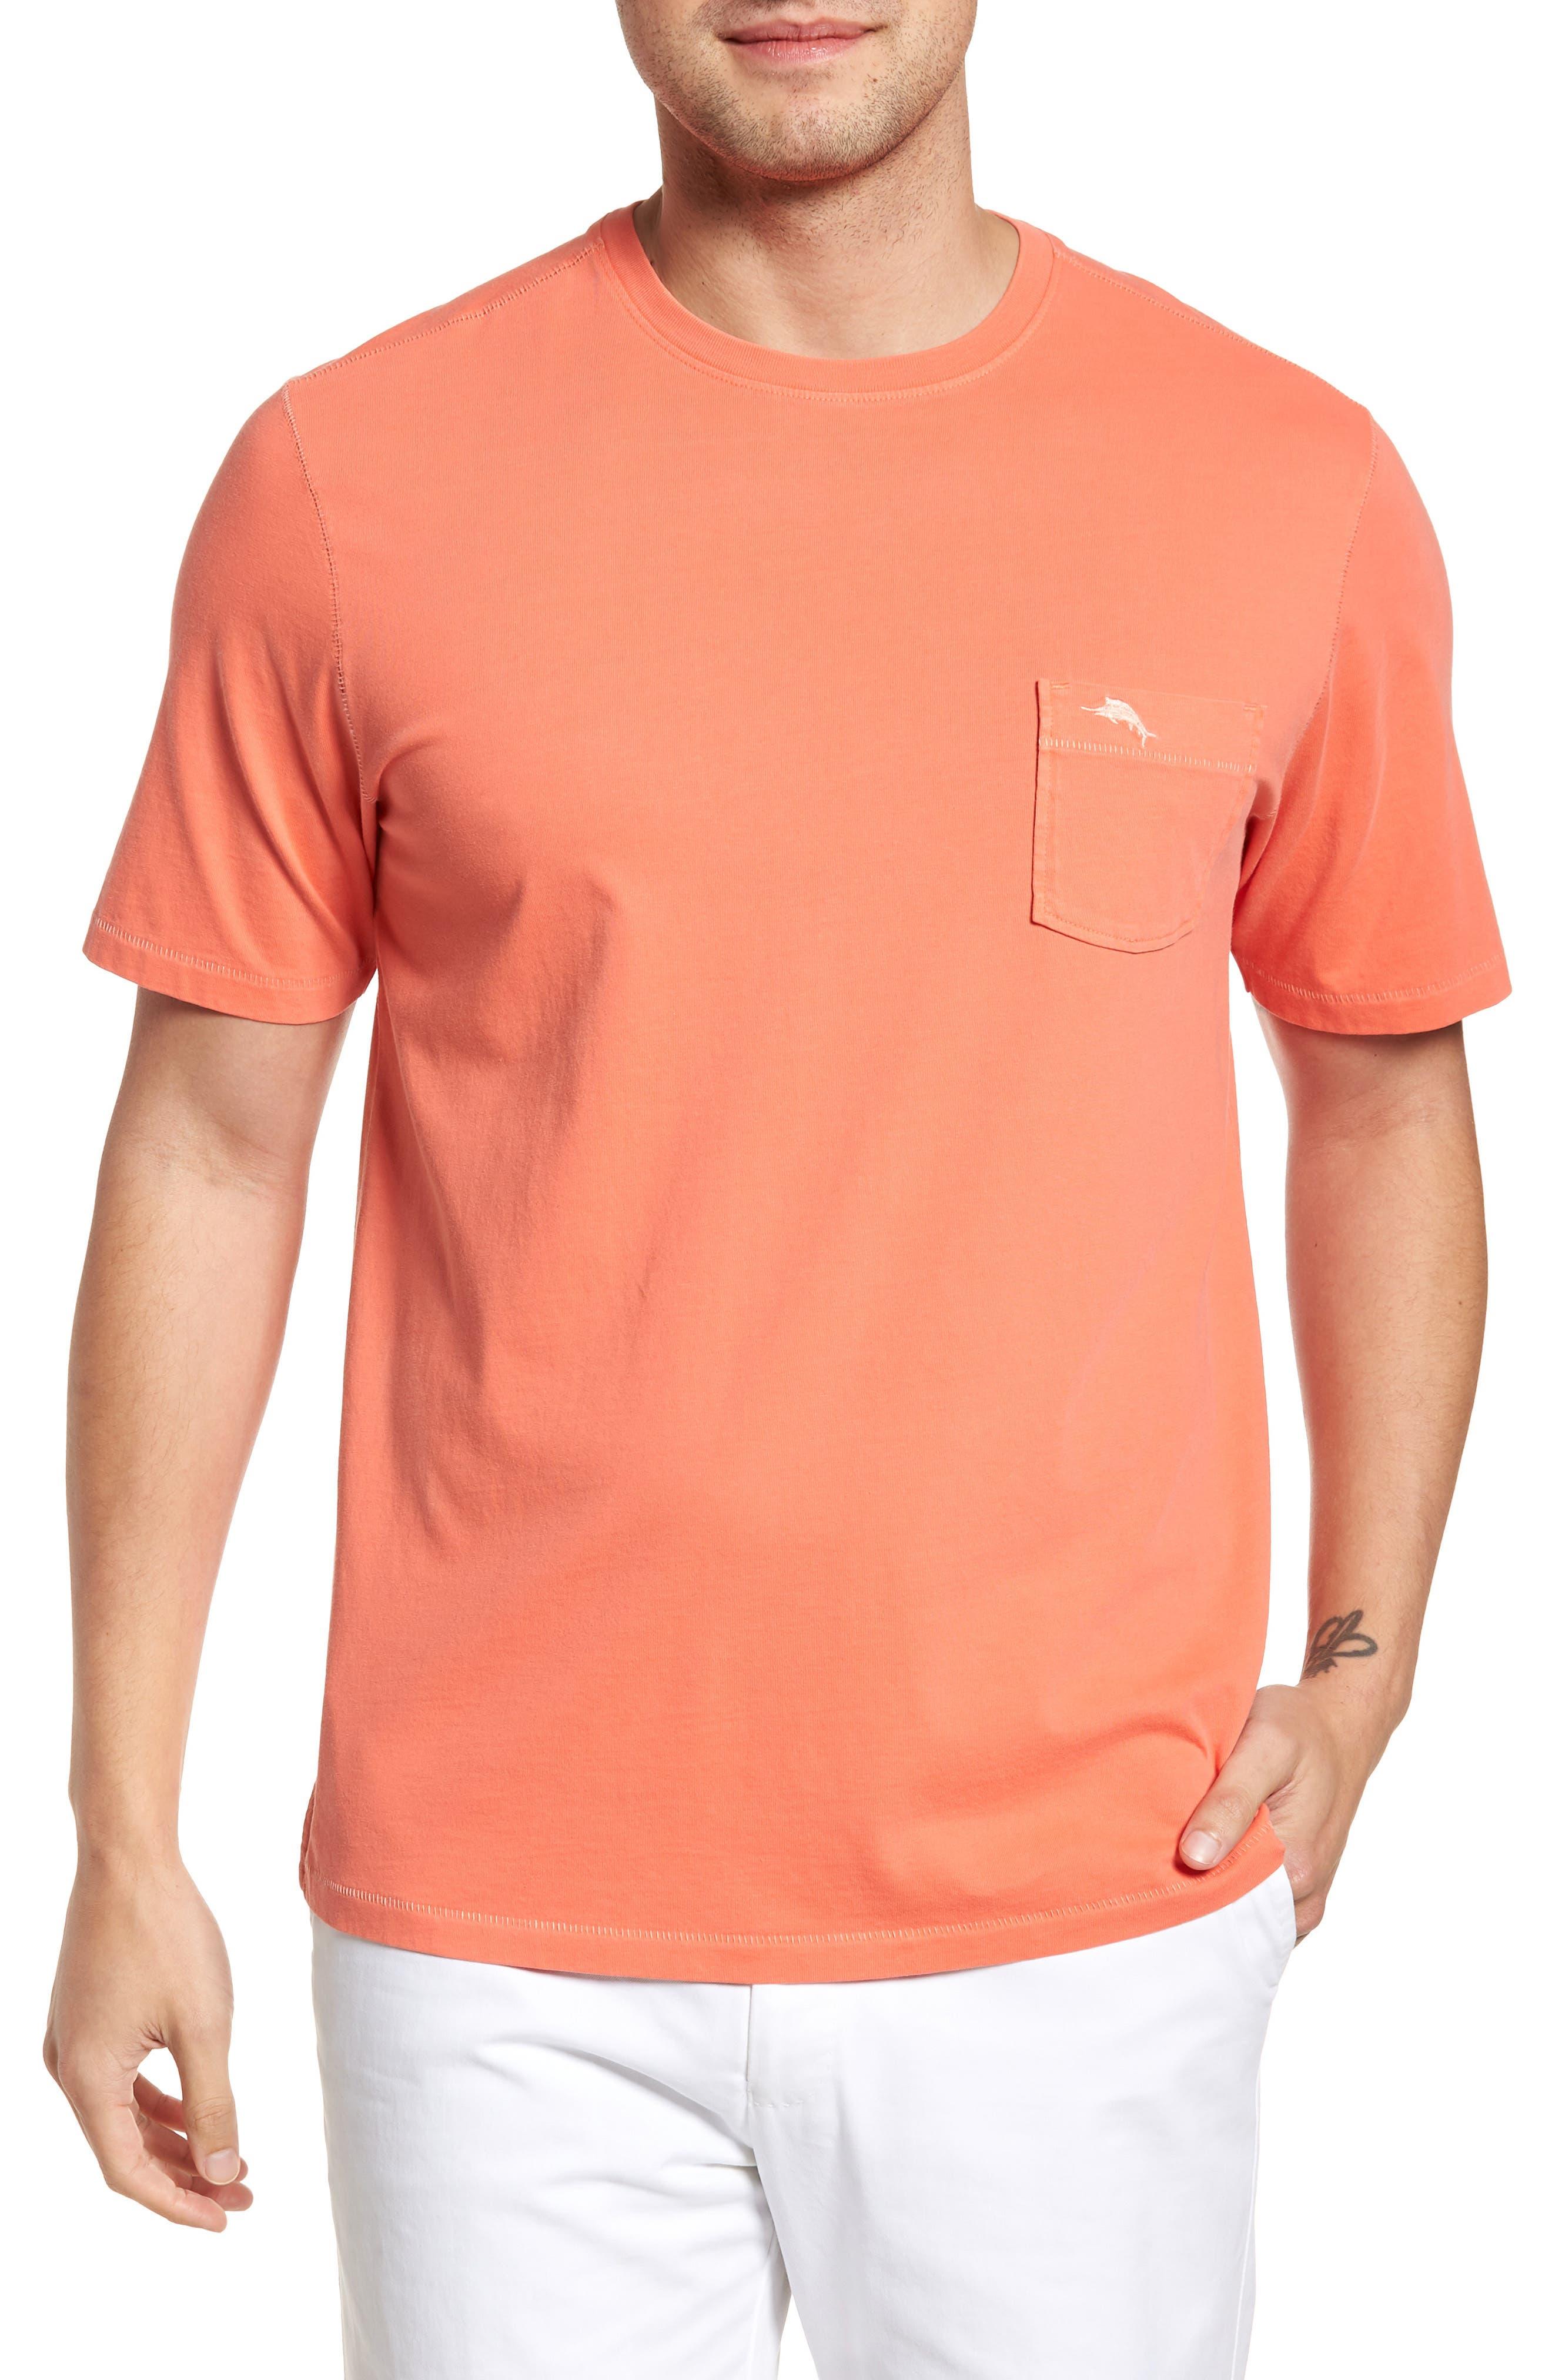 Alternate Image 1 Selected - Tommy Bahama 'New Bahama Reef' Island Modern Fit Pima Cotton Pocket T-Shirt